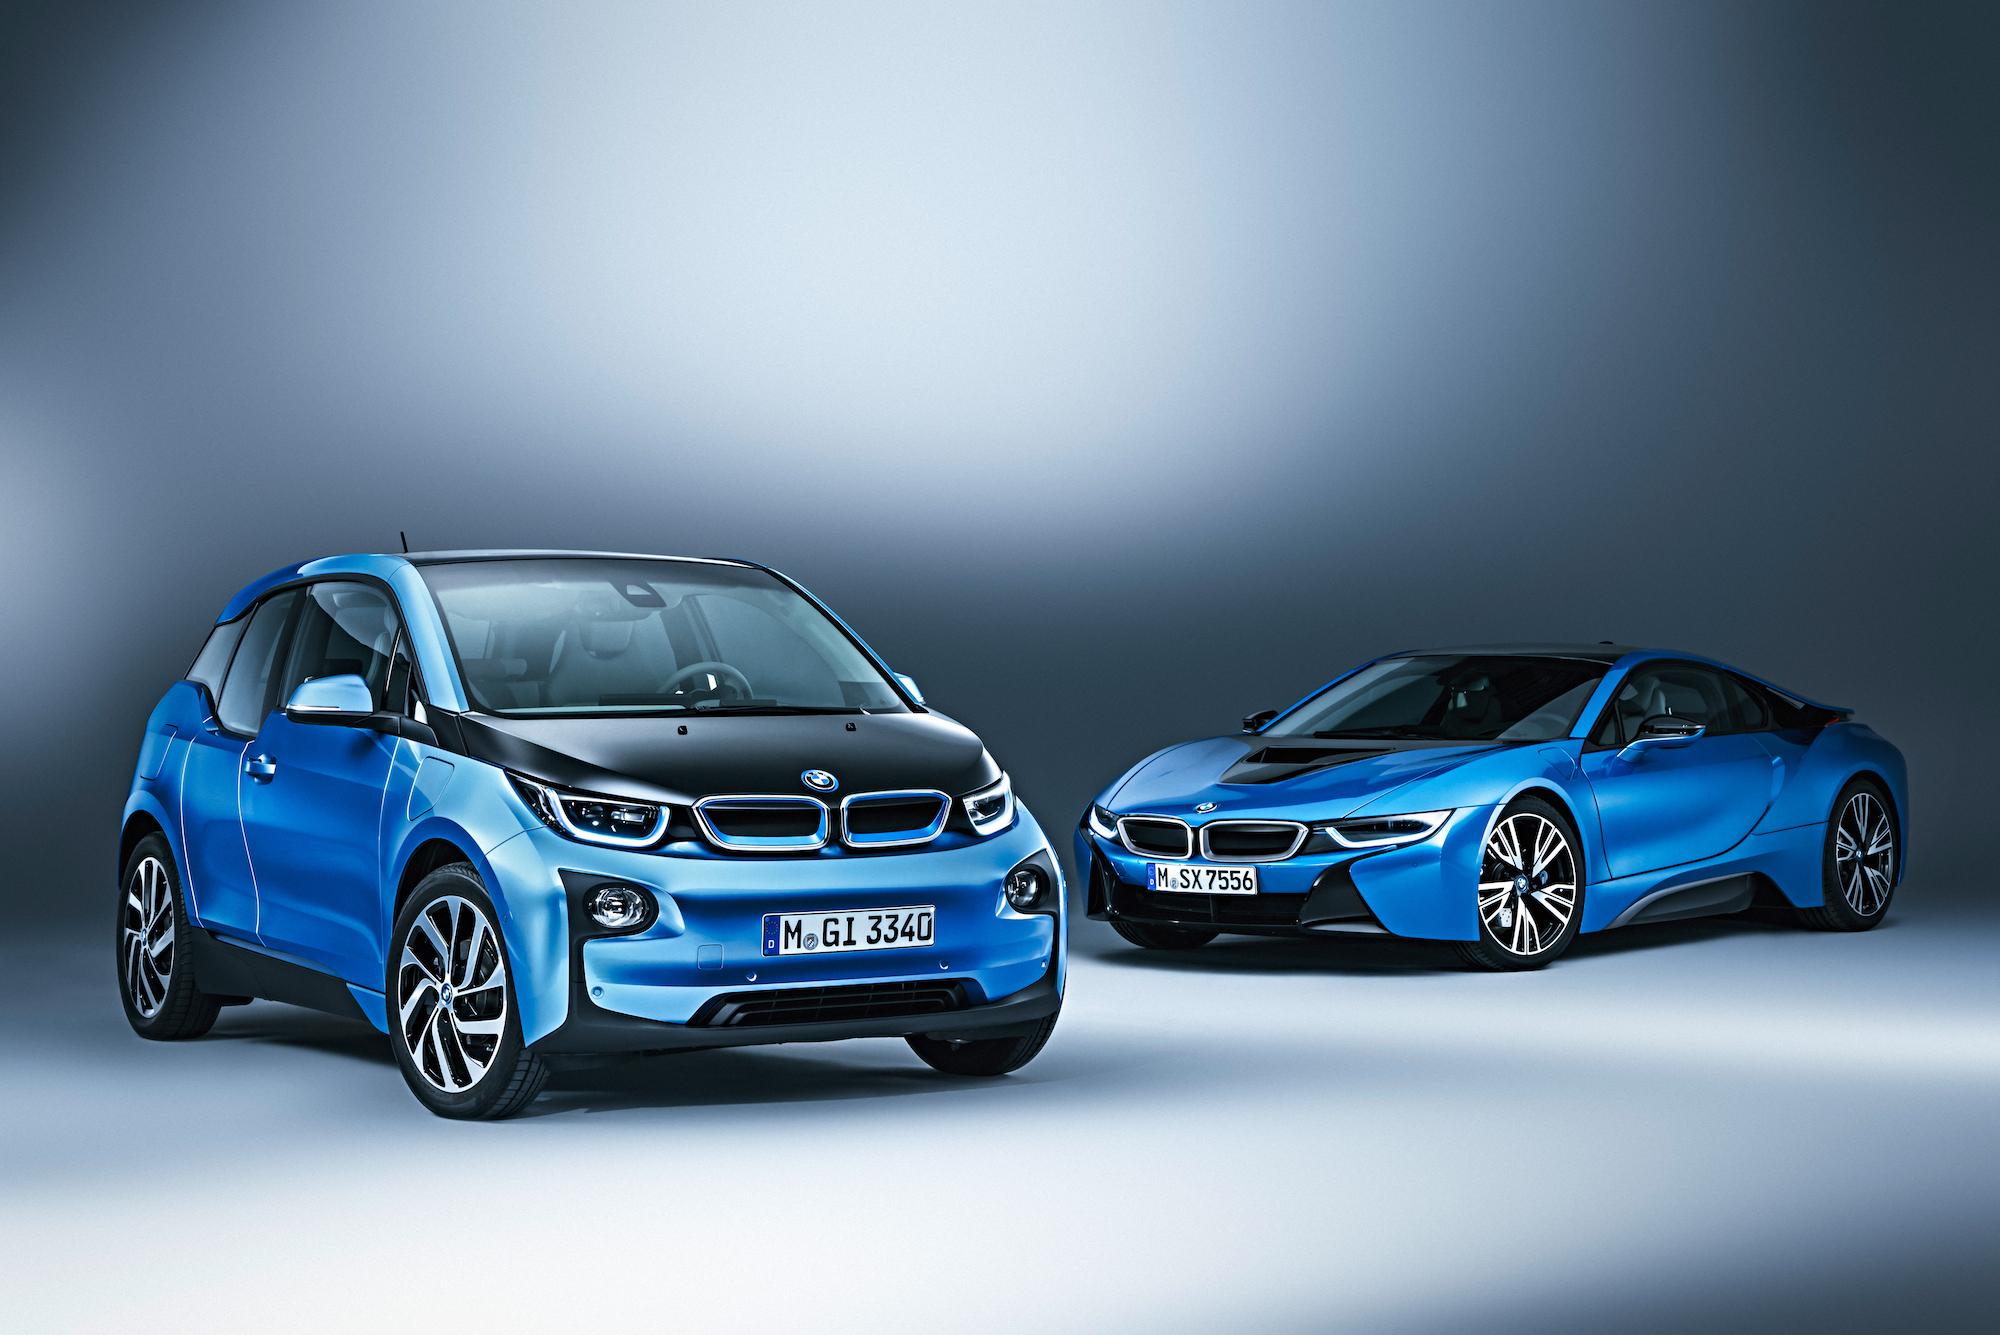 bmw-i3-protonic-blue-8